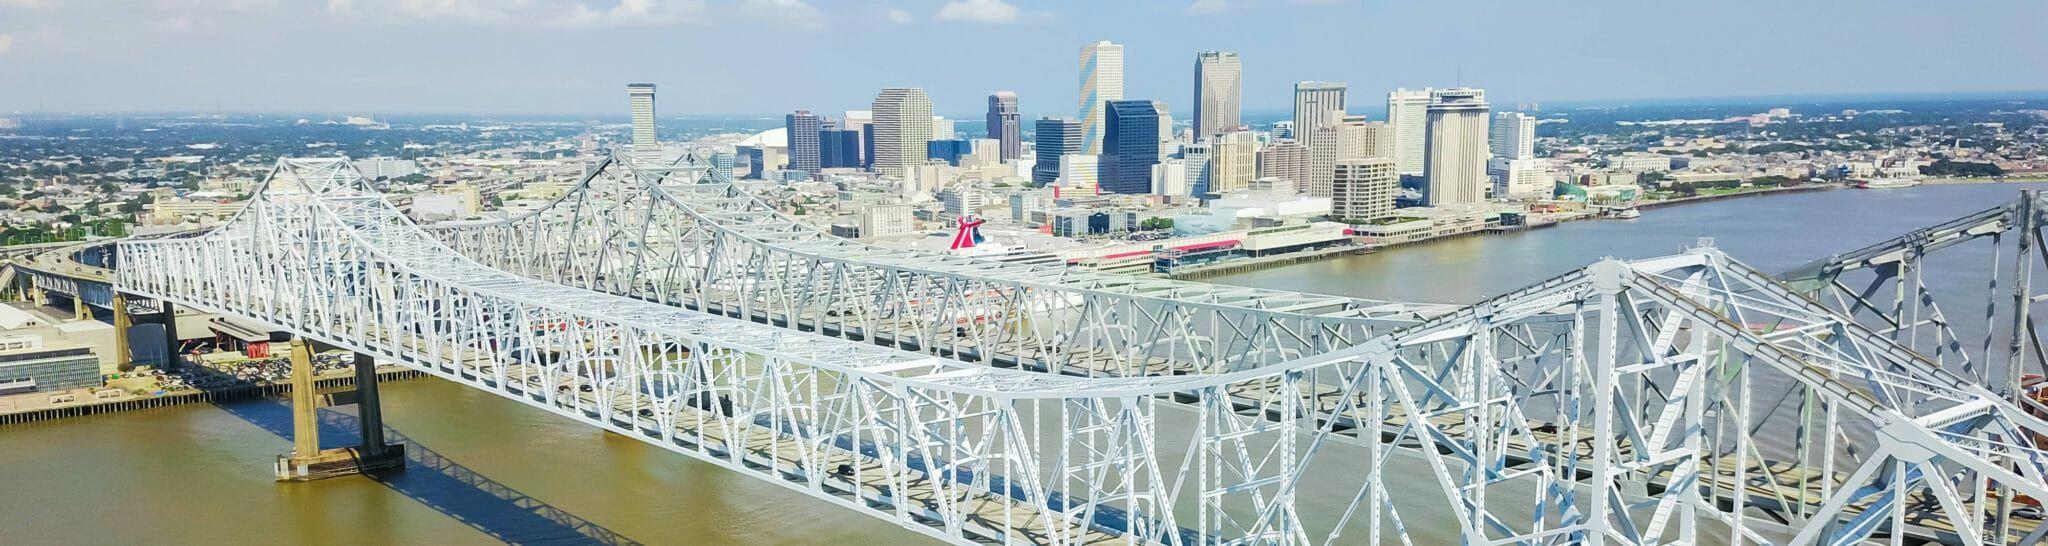 Louisiana Ignition Interlock Device Installation And Dwi Laws